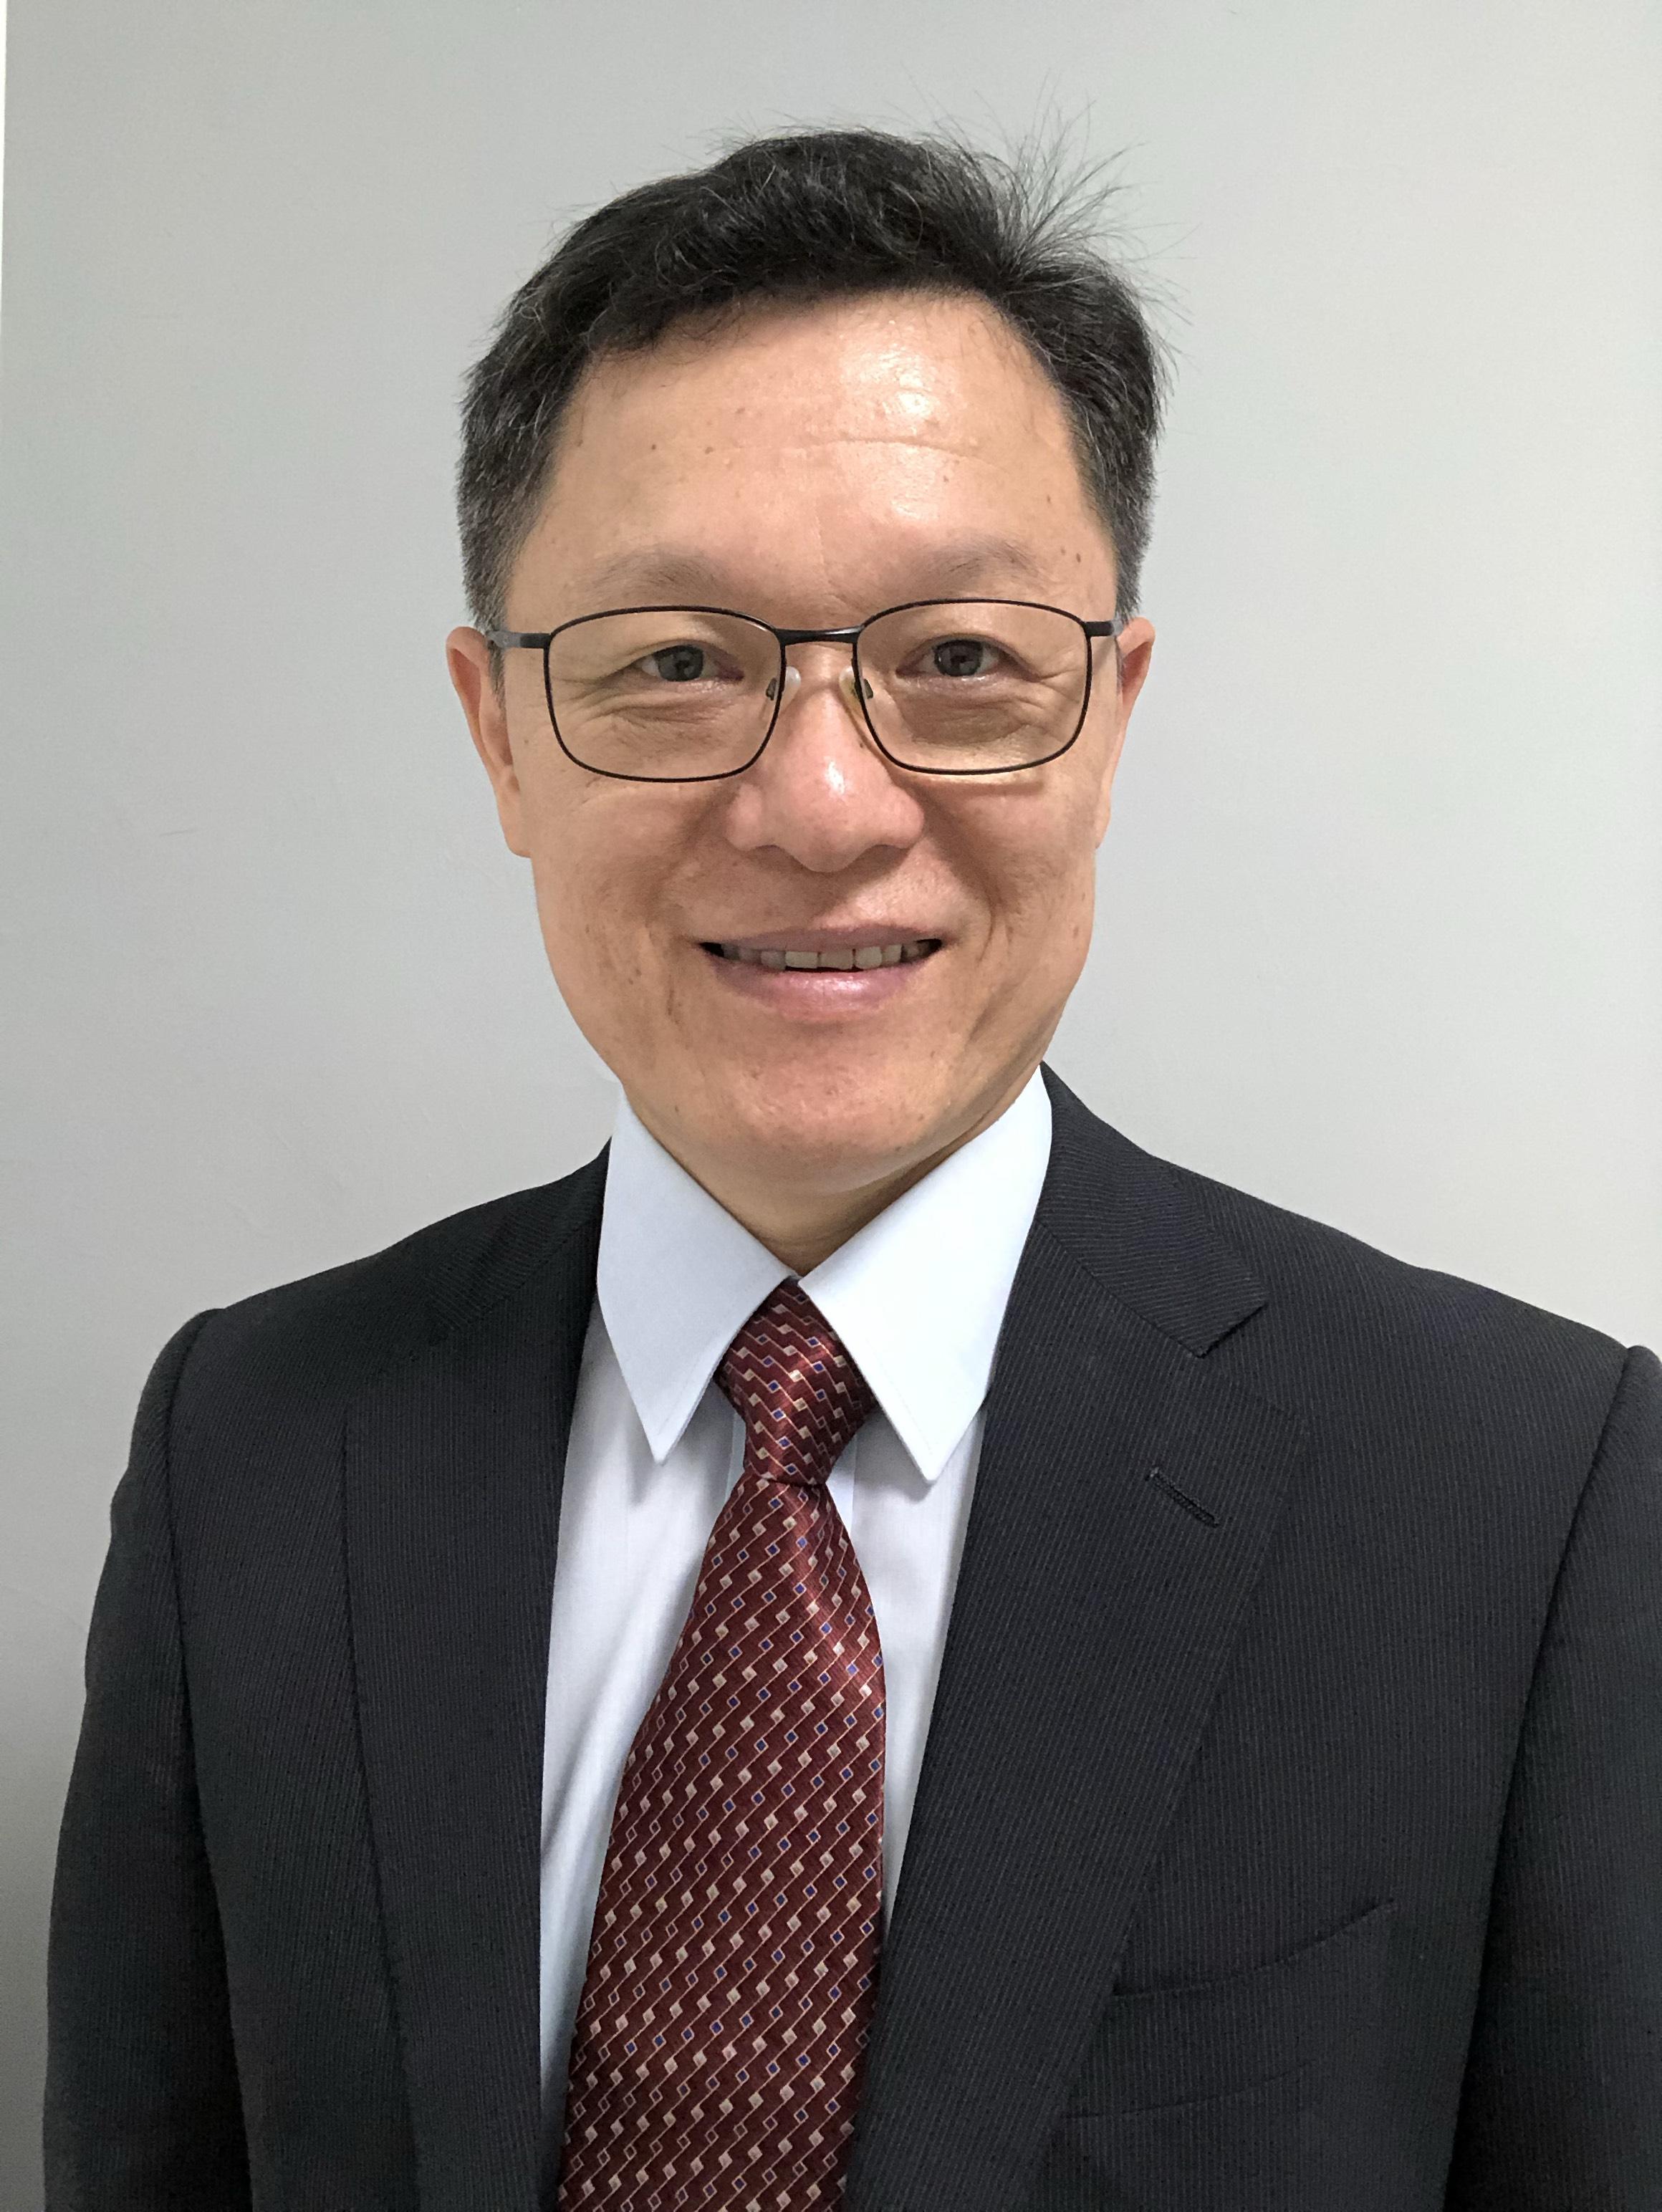 吳佳城博士